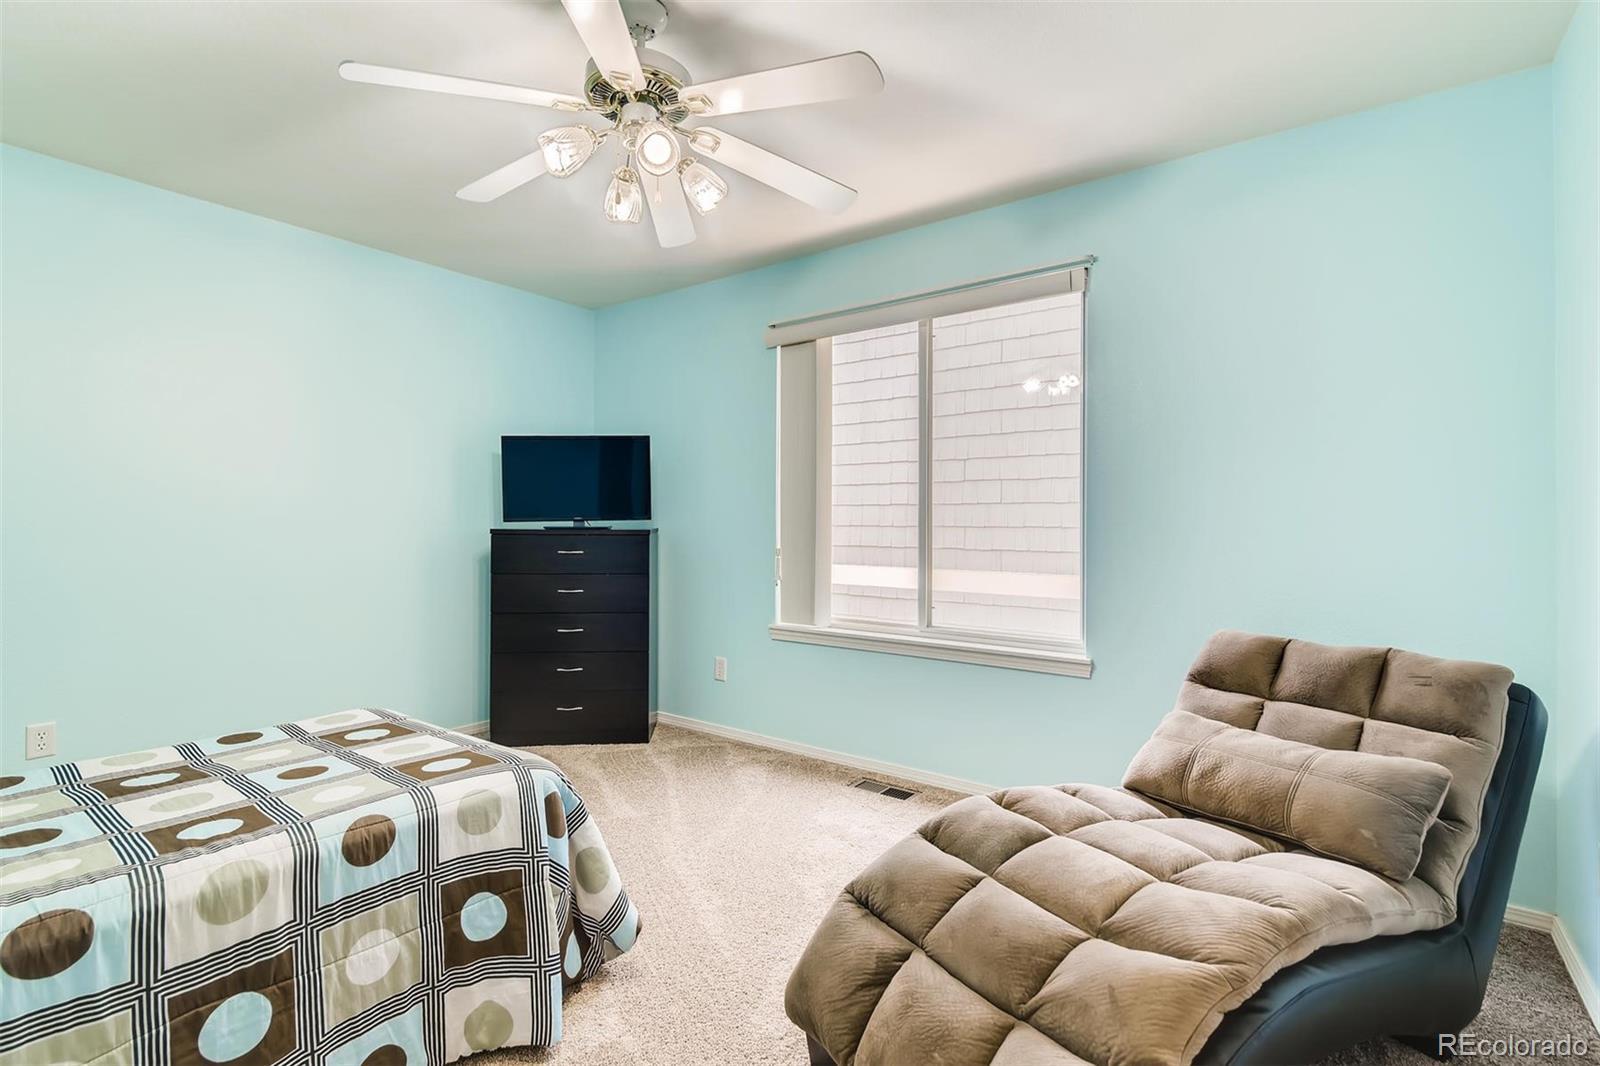 MLS# 9724731 - 23 - 498 Promontory Drive, Loveland, CO 80537